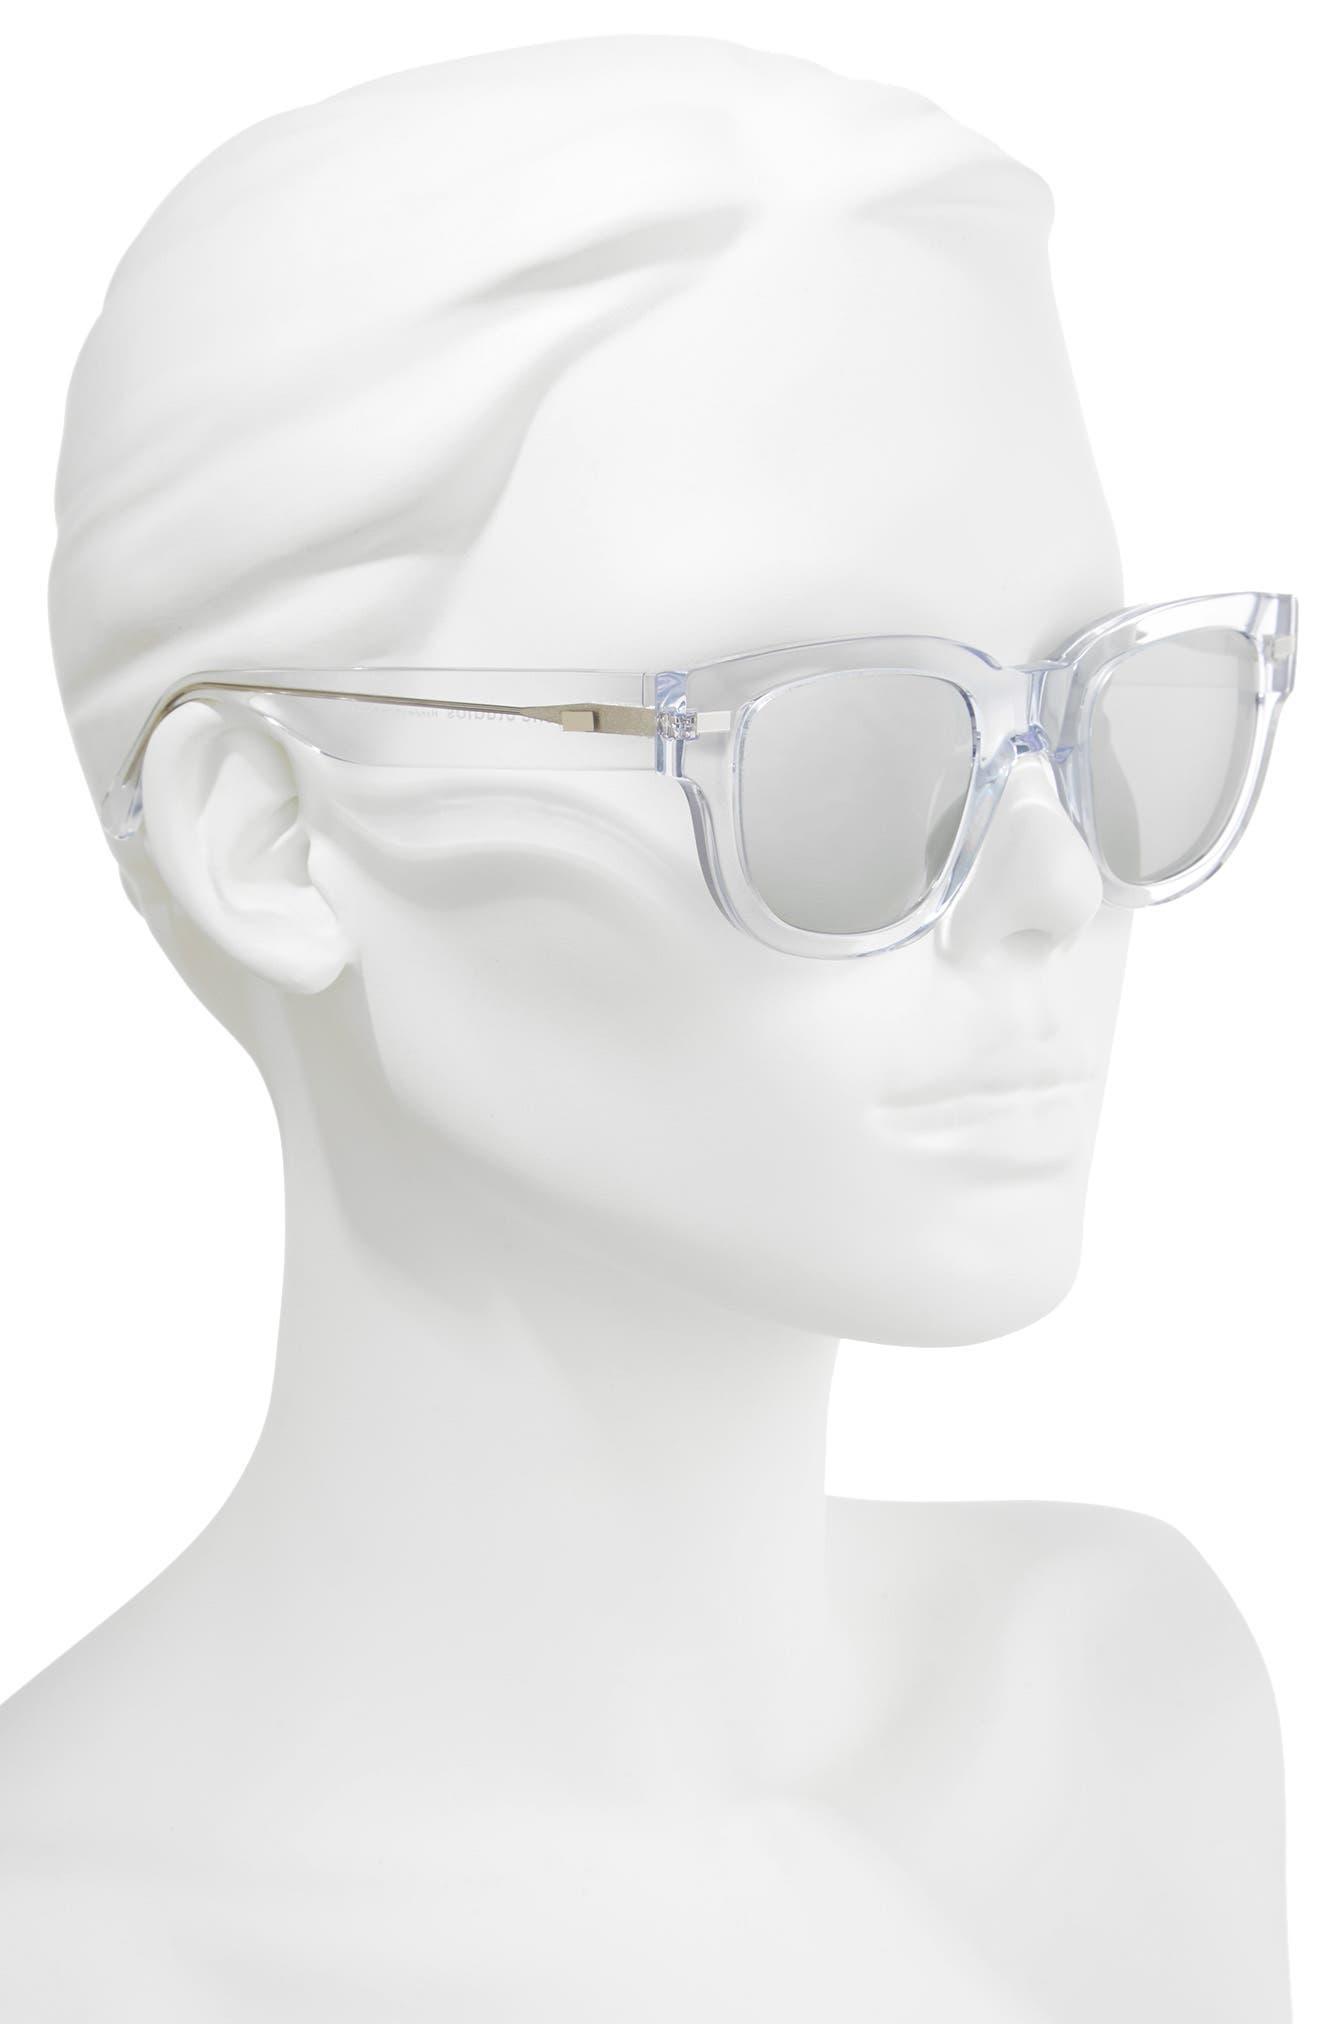 47mm Sunglasses,                             Alternate thumbnail 3, color,